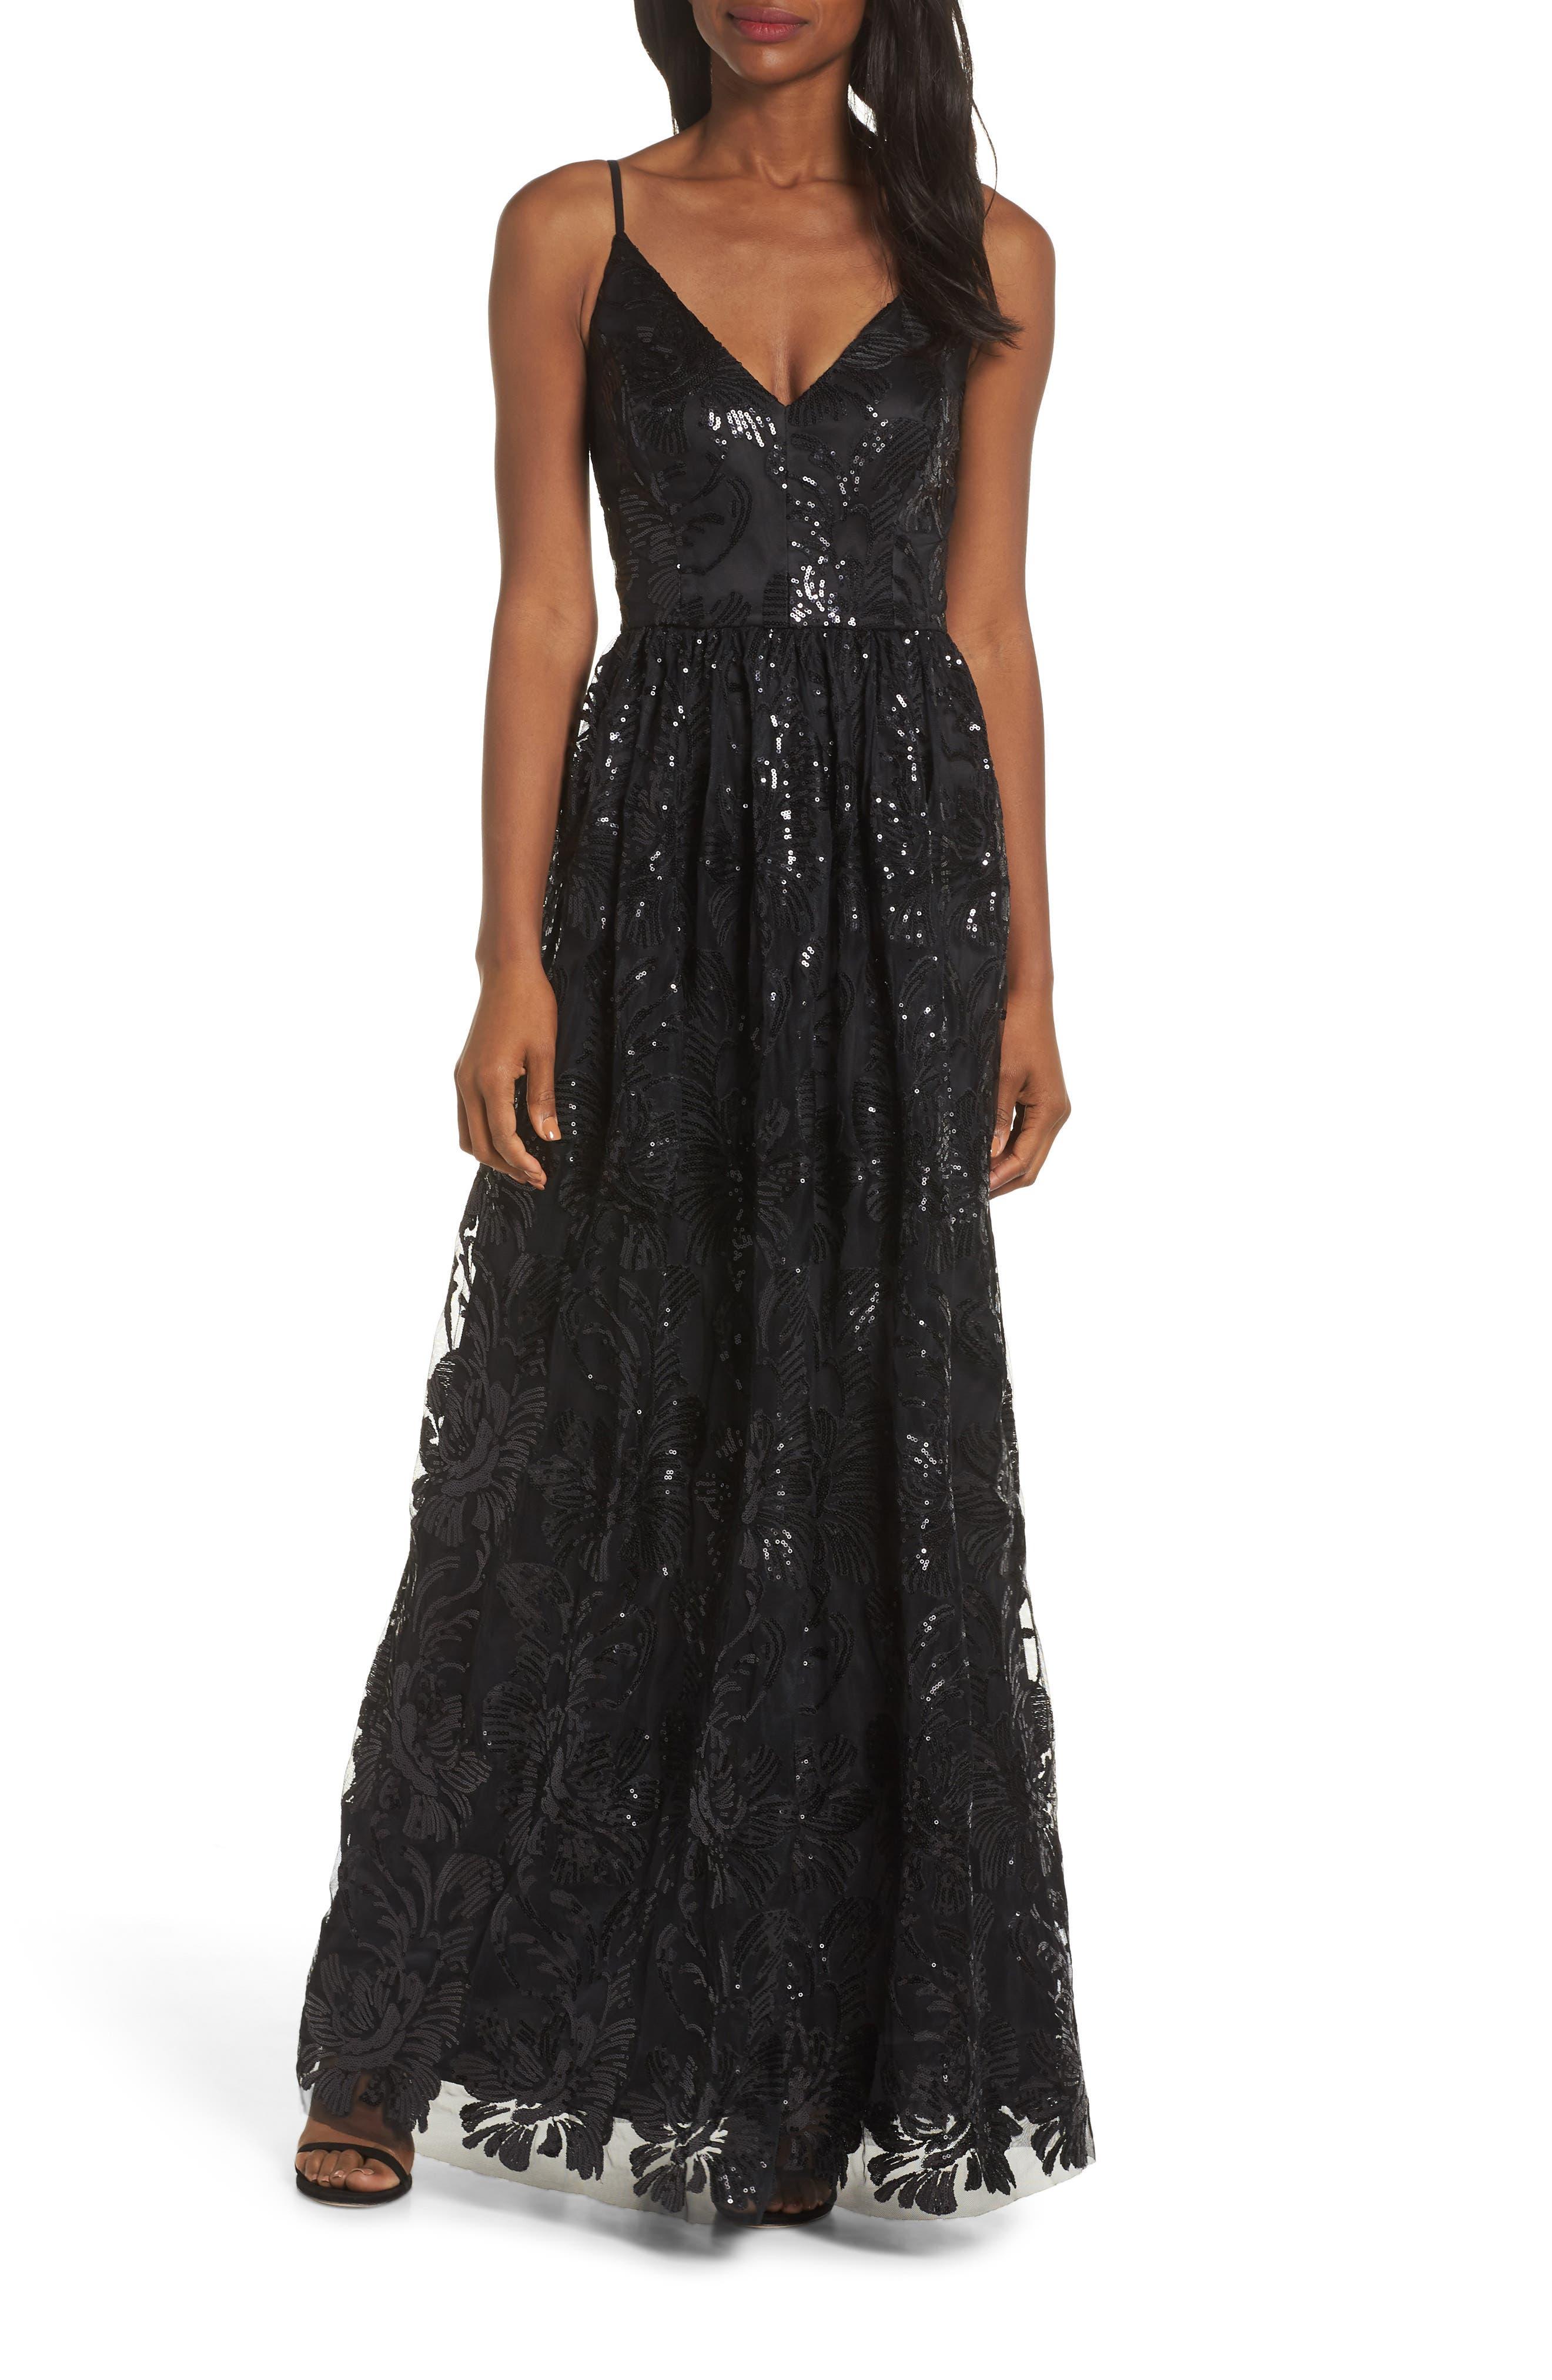 ELIZA J Sequin Embroidered Mesh Evening Dress, Main, color, BLACK